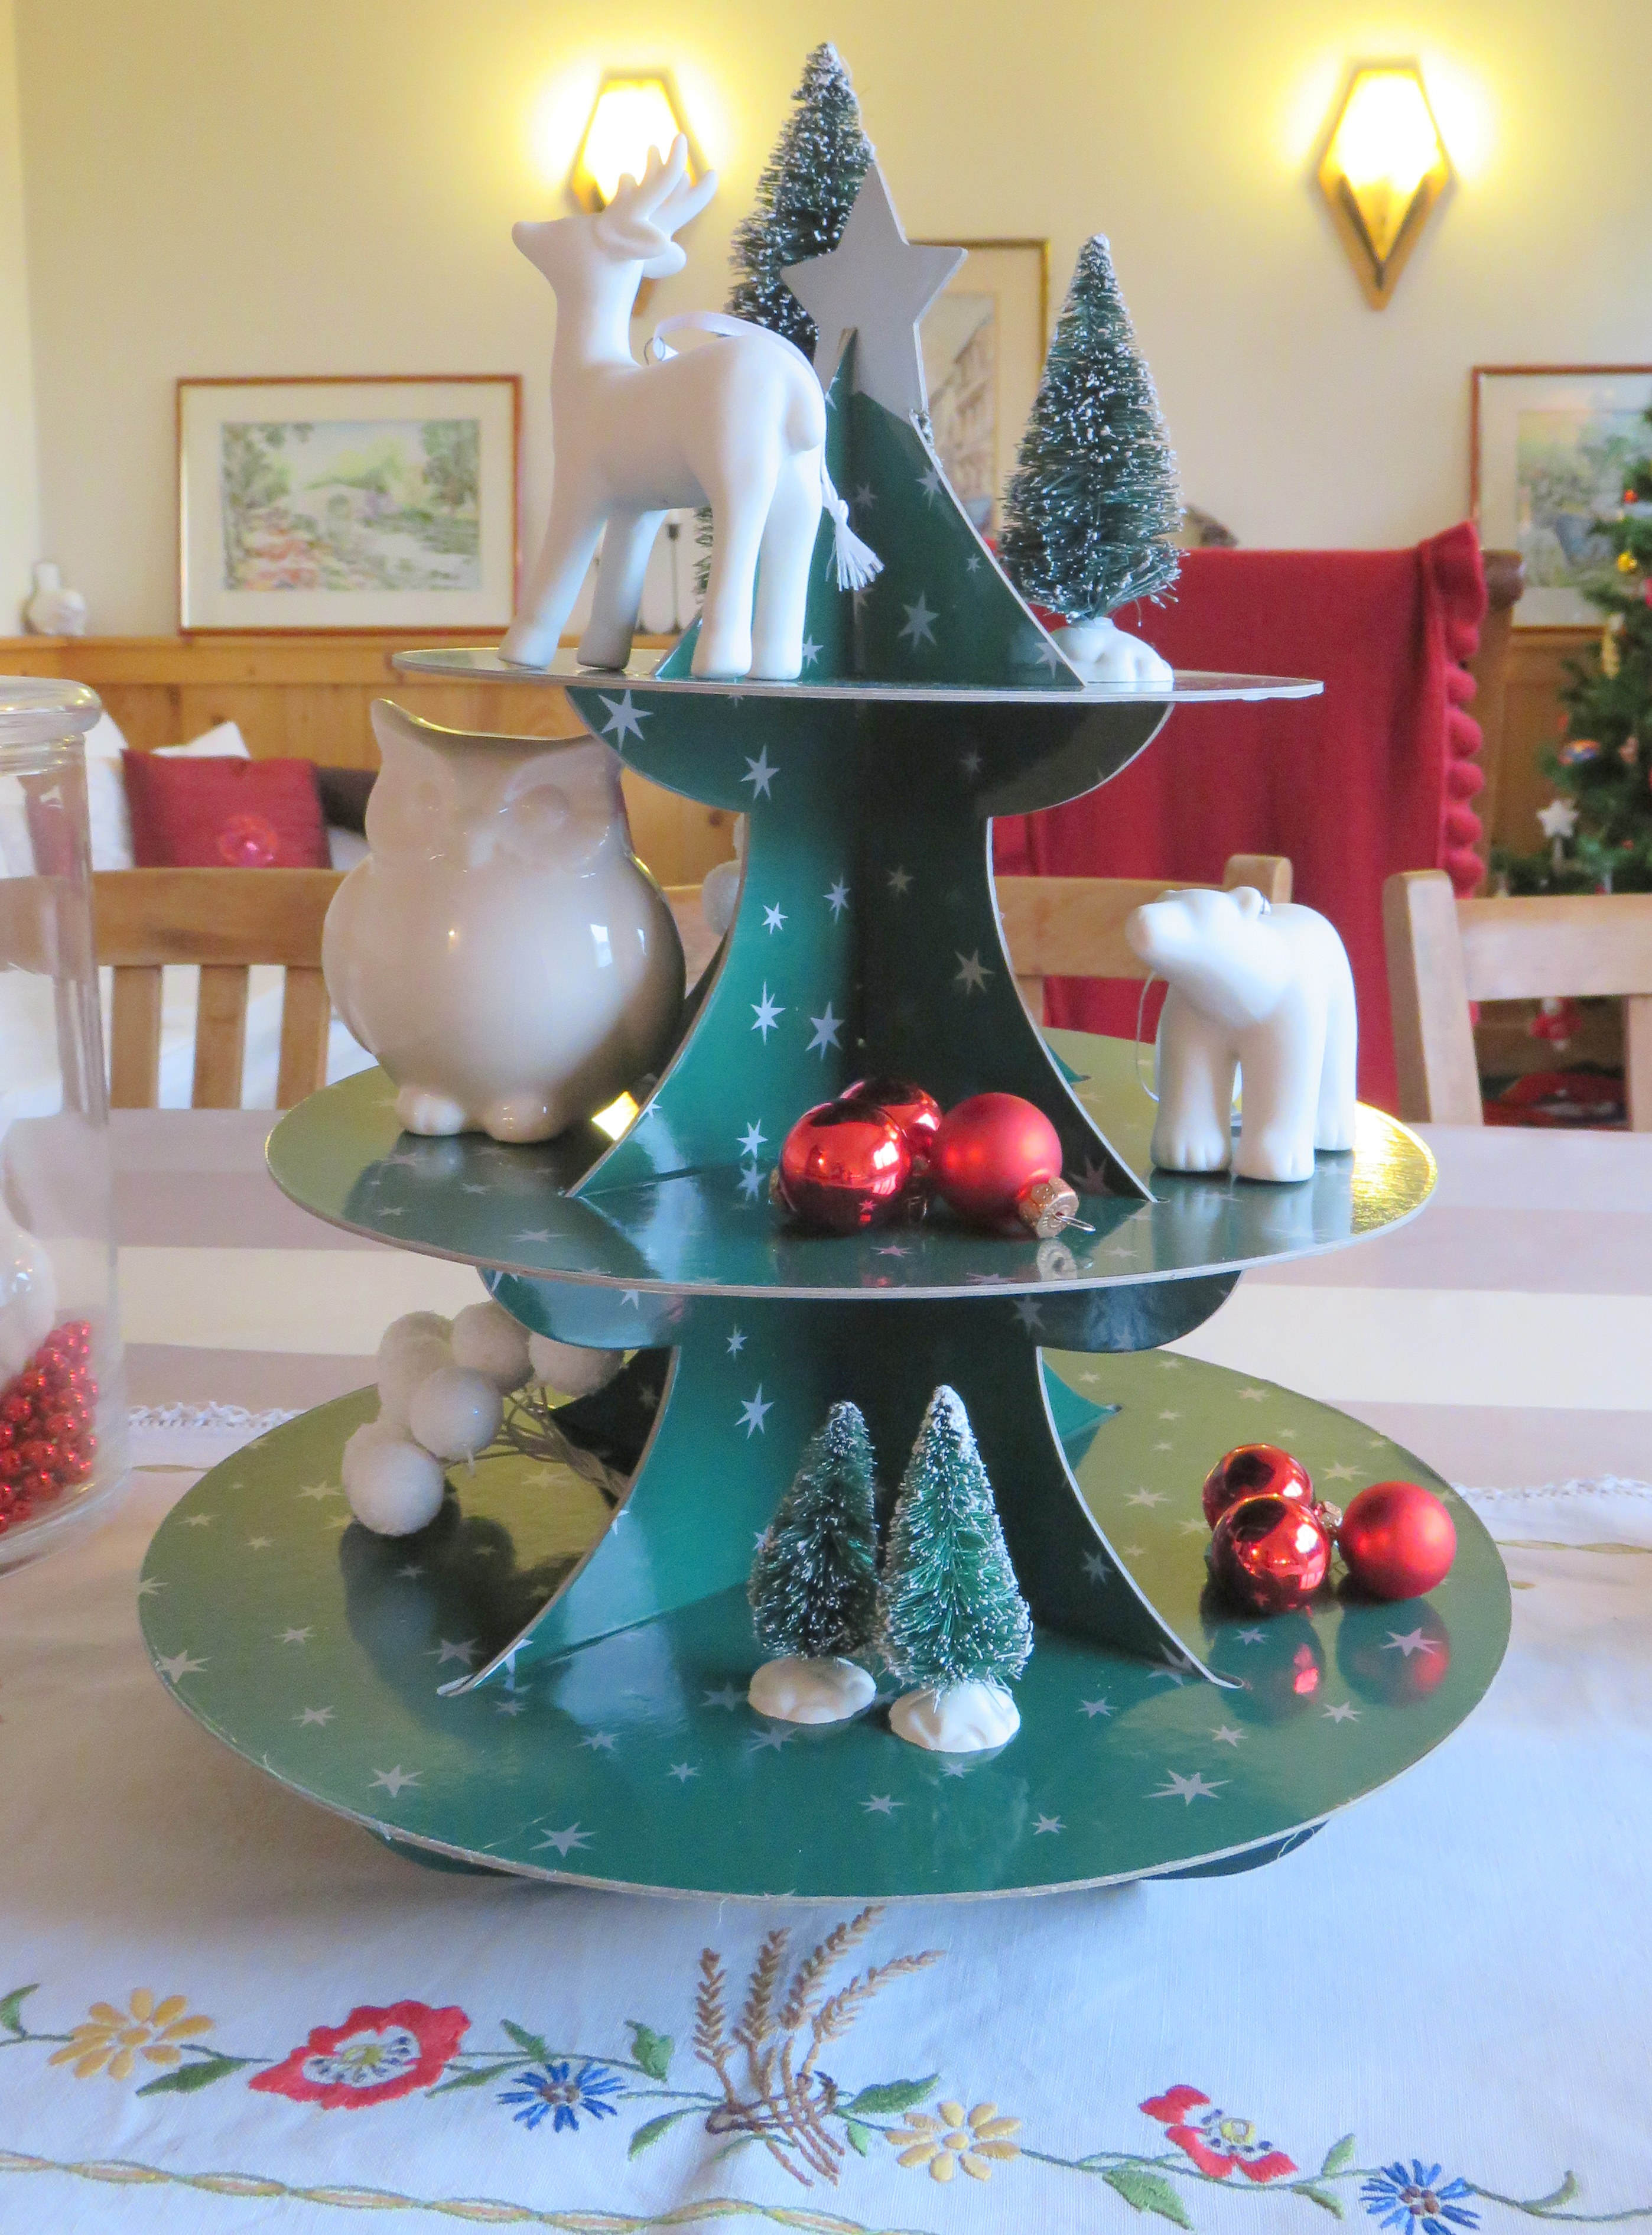 Christmas Home Tour 2015 ! Ma maison pour Noël !